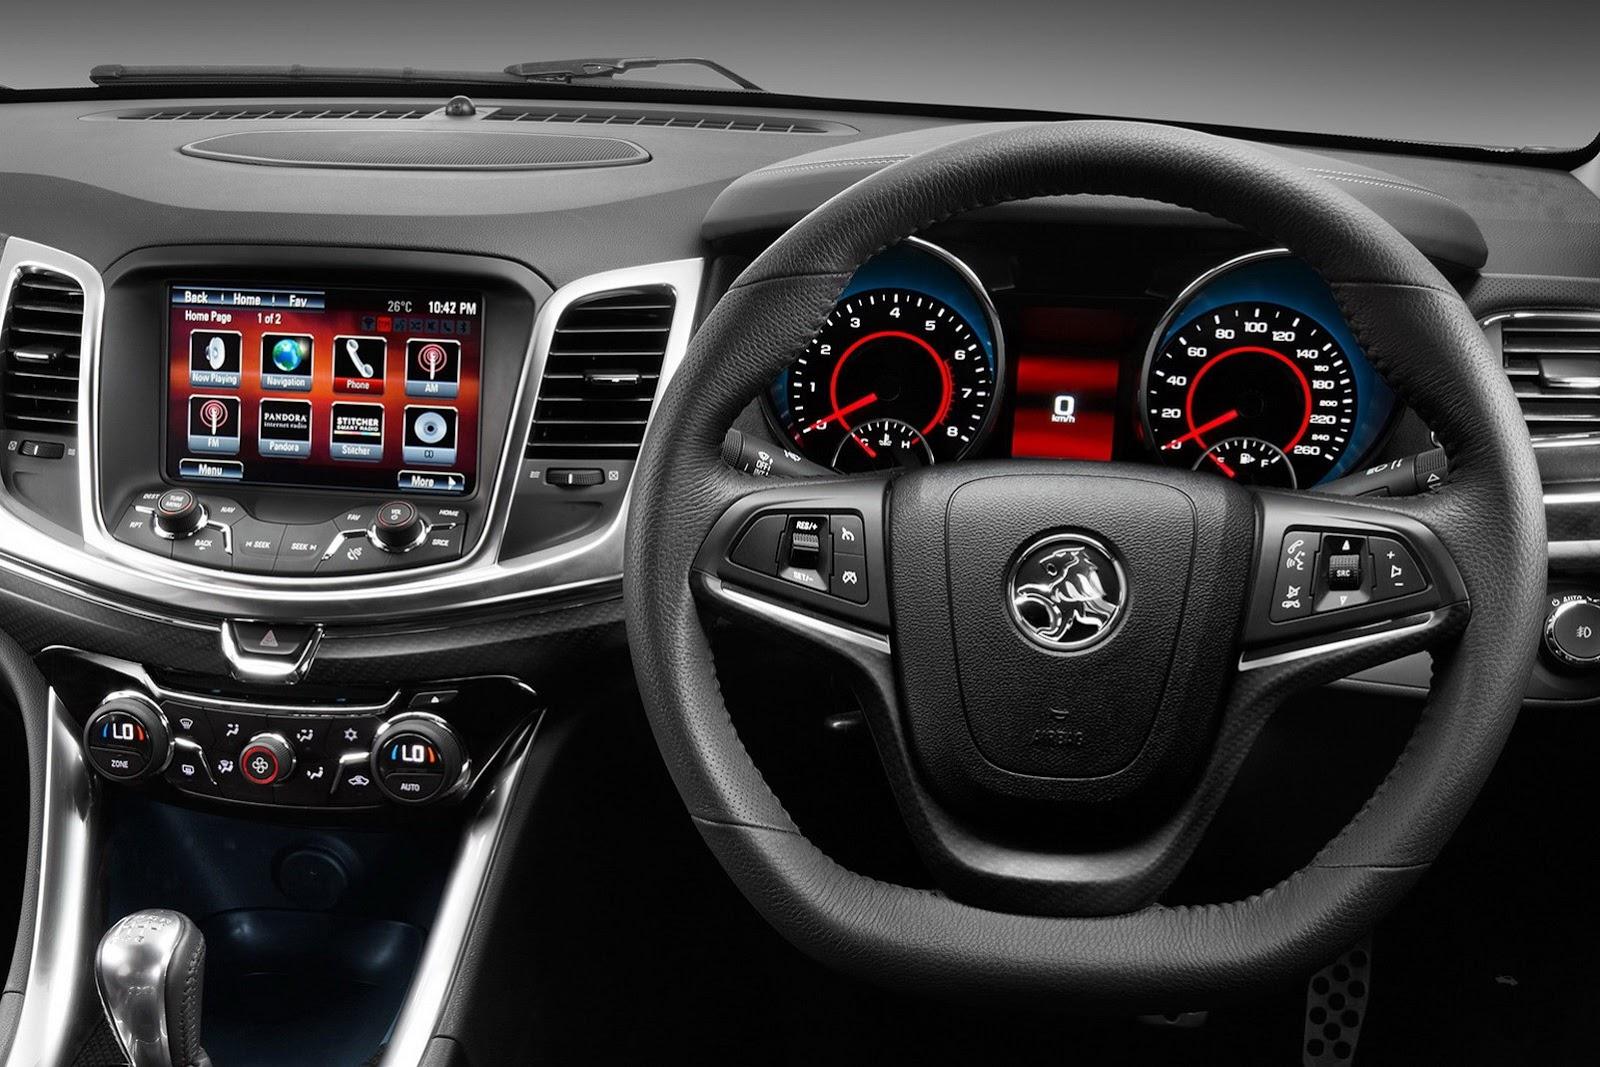 Holden VF Commodore SSV Redline (2014) - pictures, information & specs